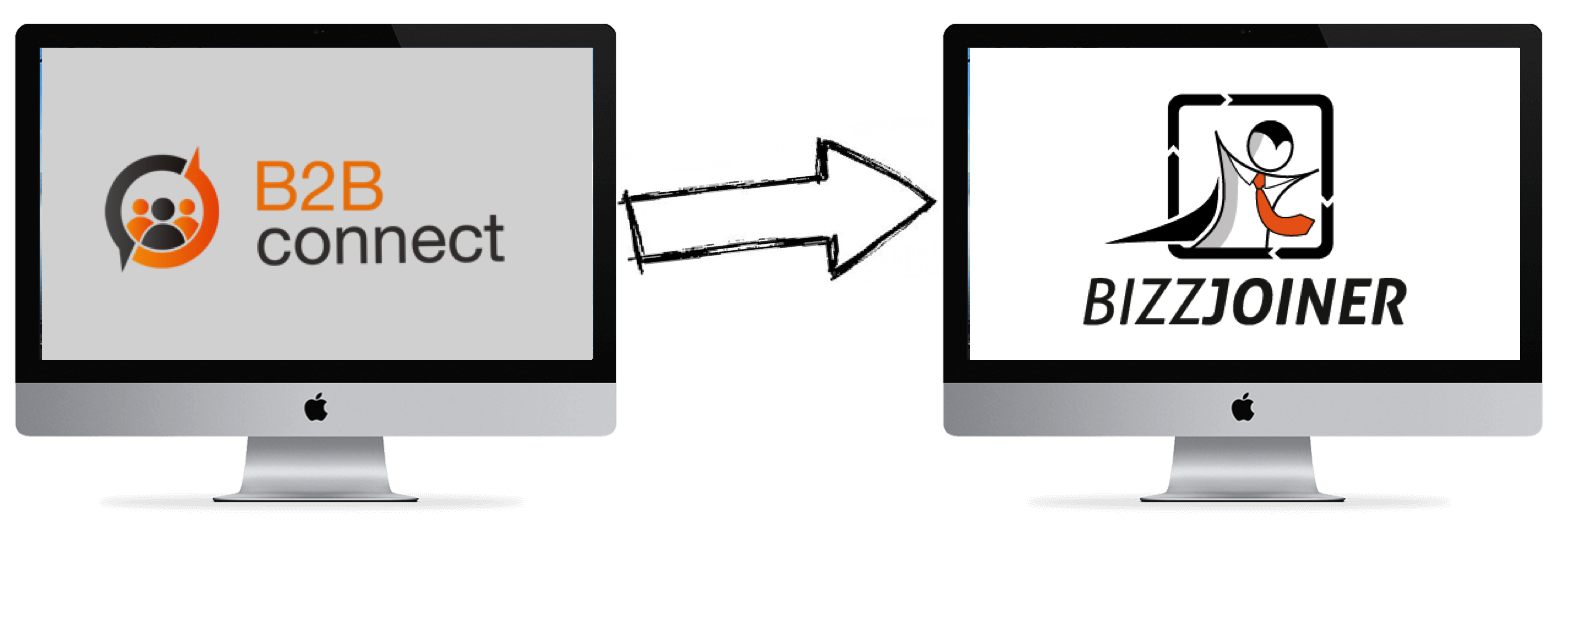 Kundportalen EffektConnect byter namn till Bizzjoiner